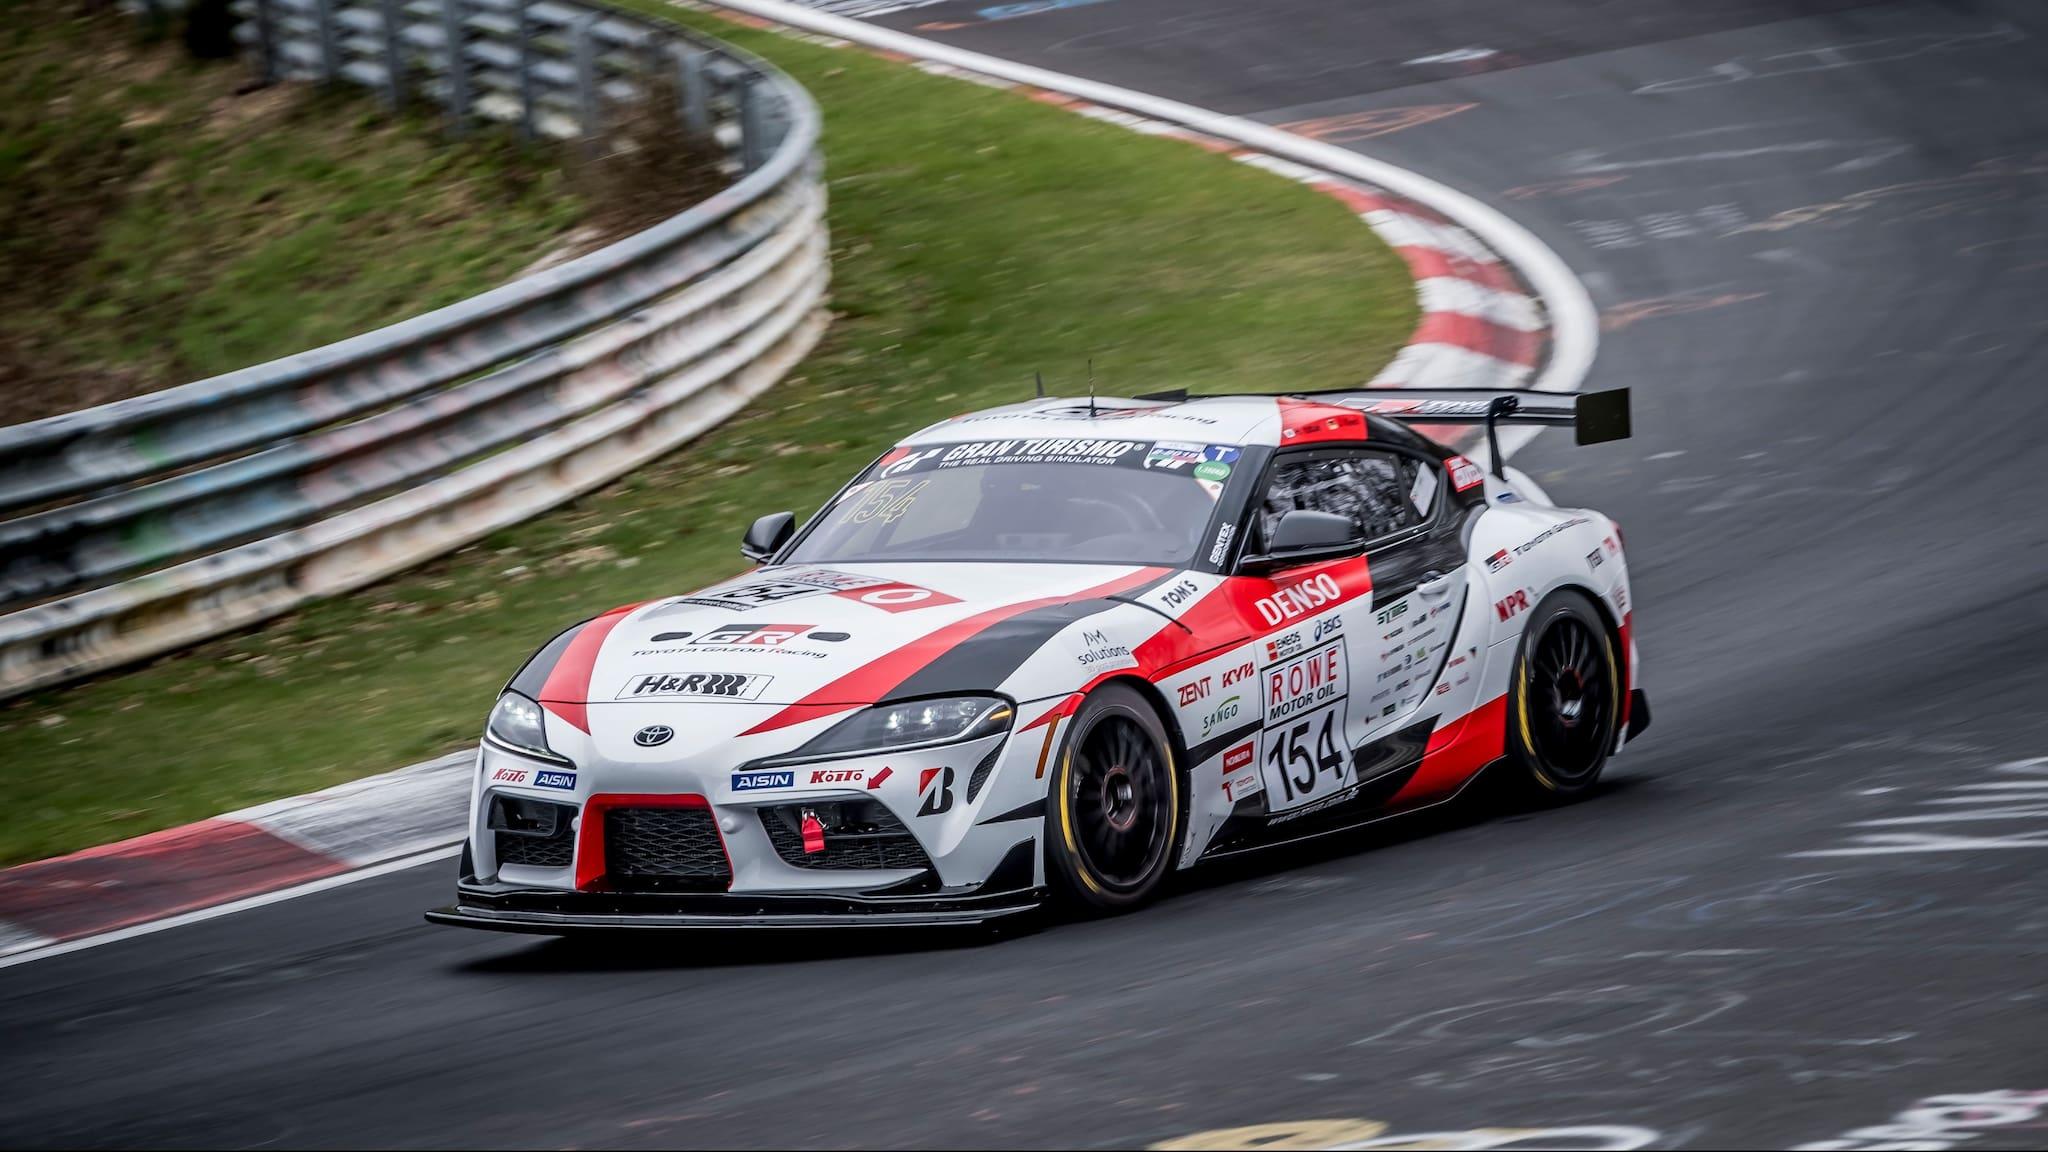 Toyota to Run GR Supra in Nürburgring 24 Hours Endurance Race